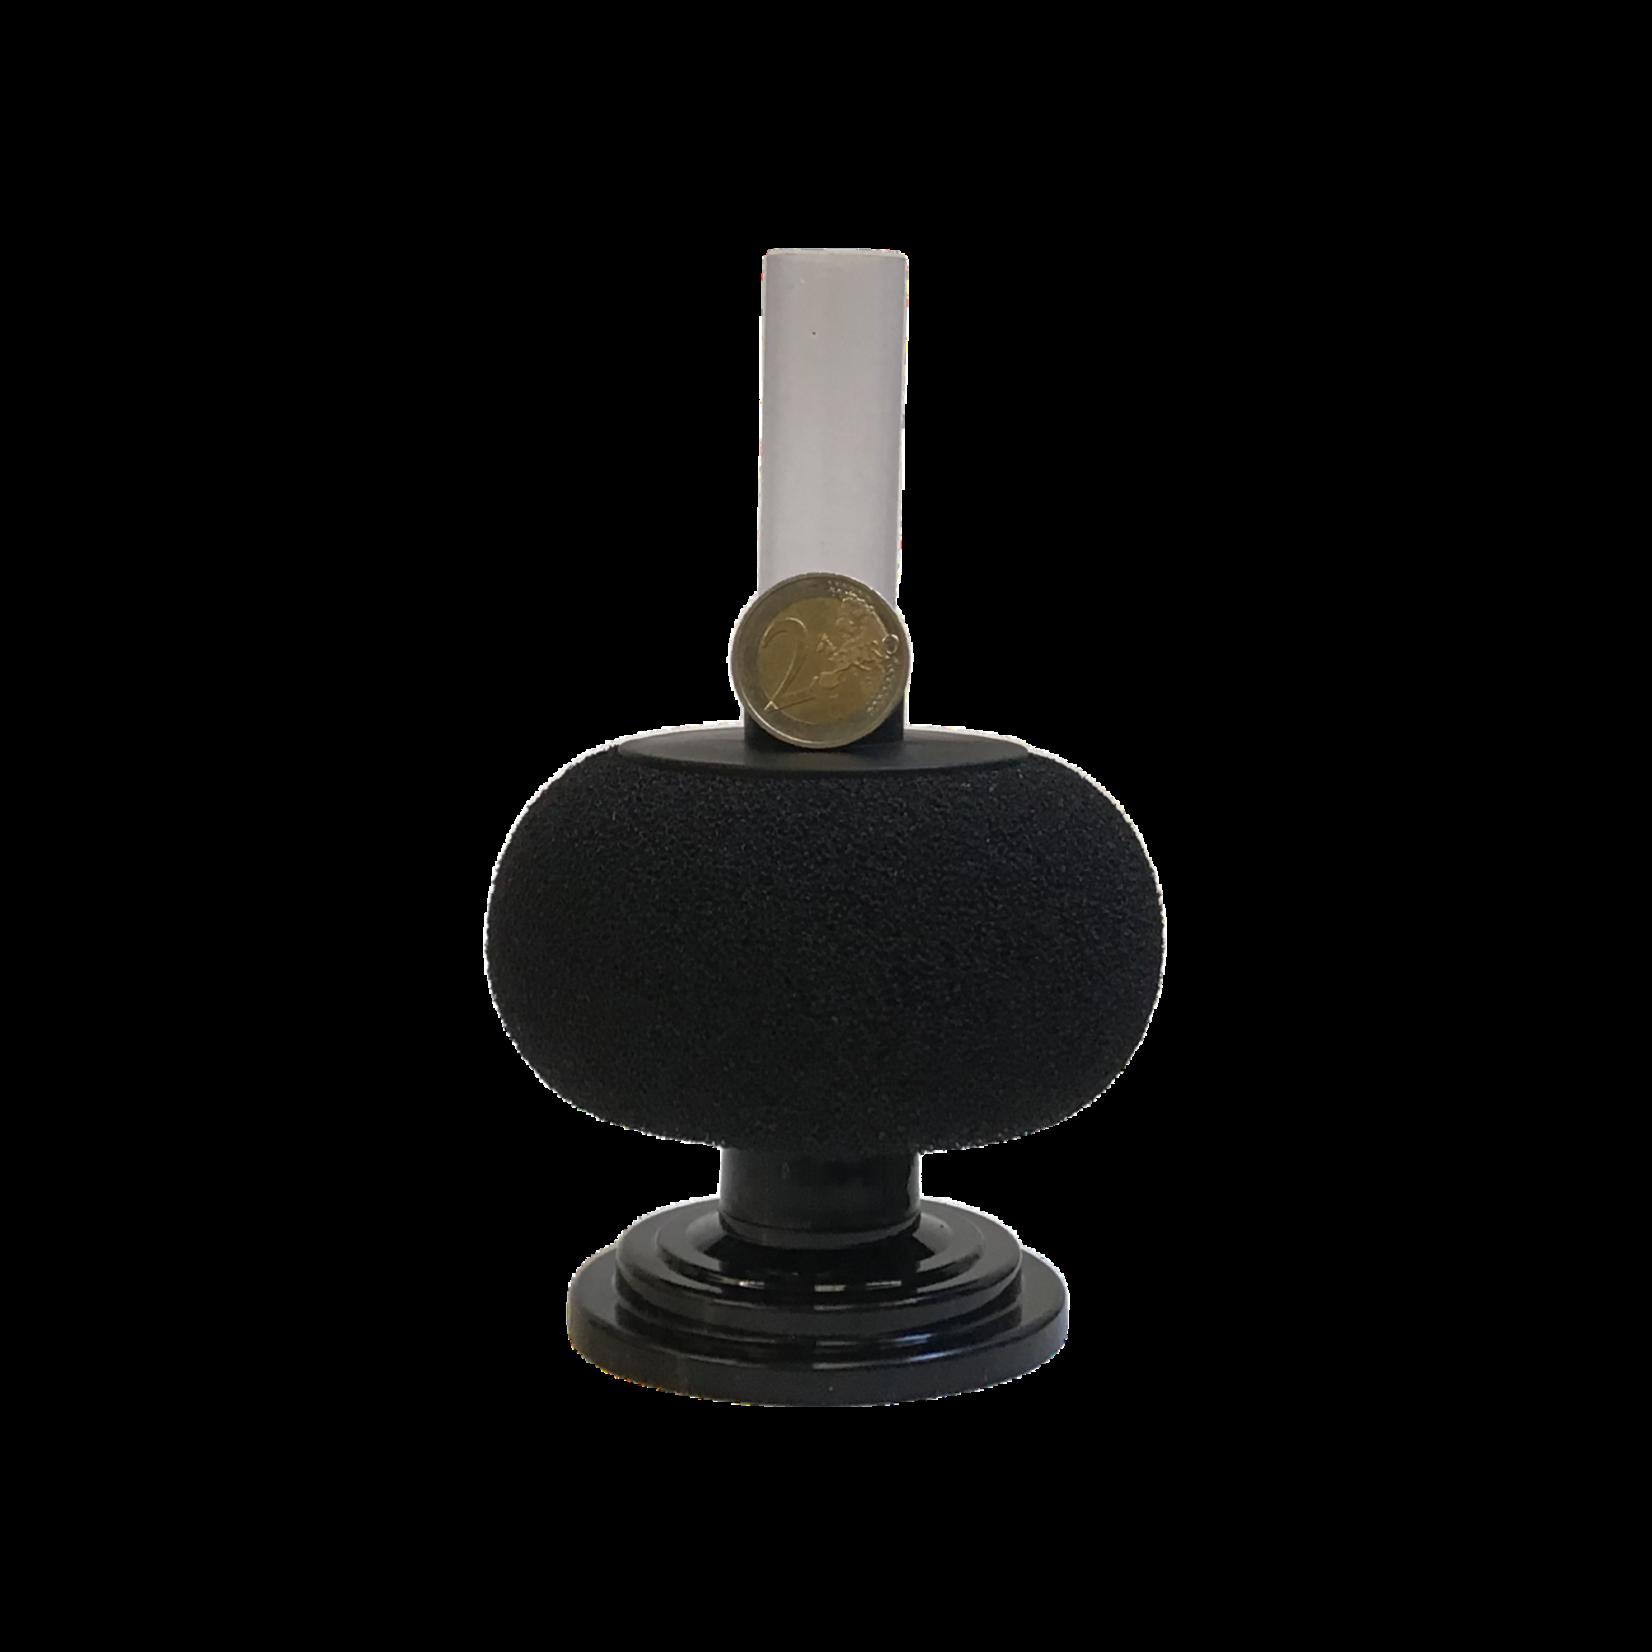 Aqua Nova Enhancer 200L kogelsponsfilter